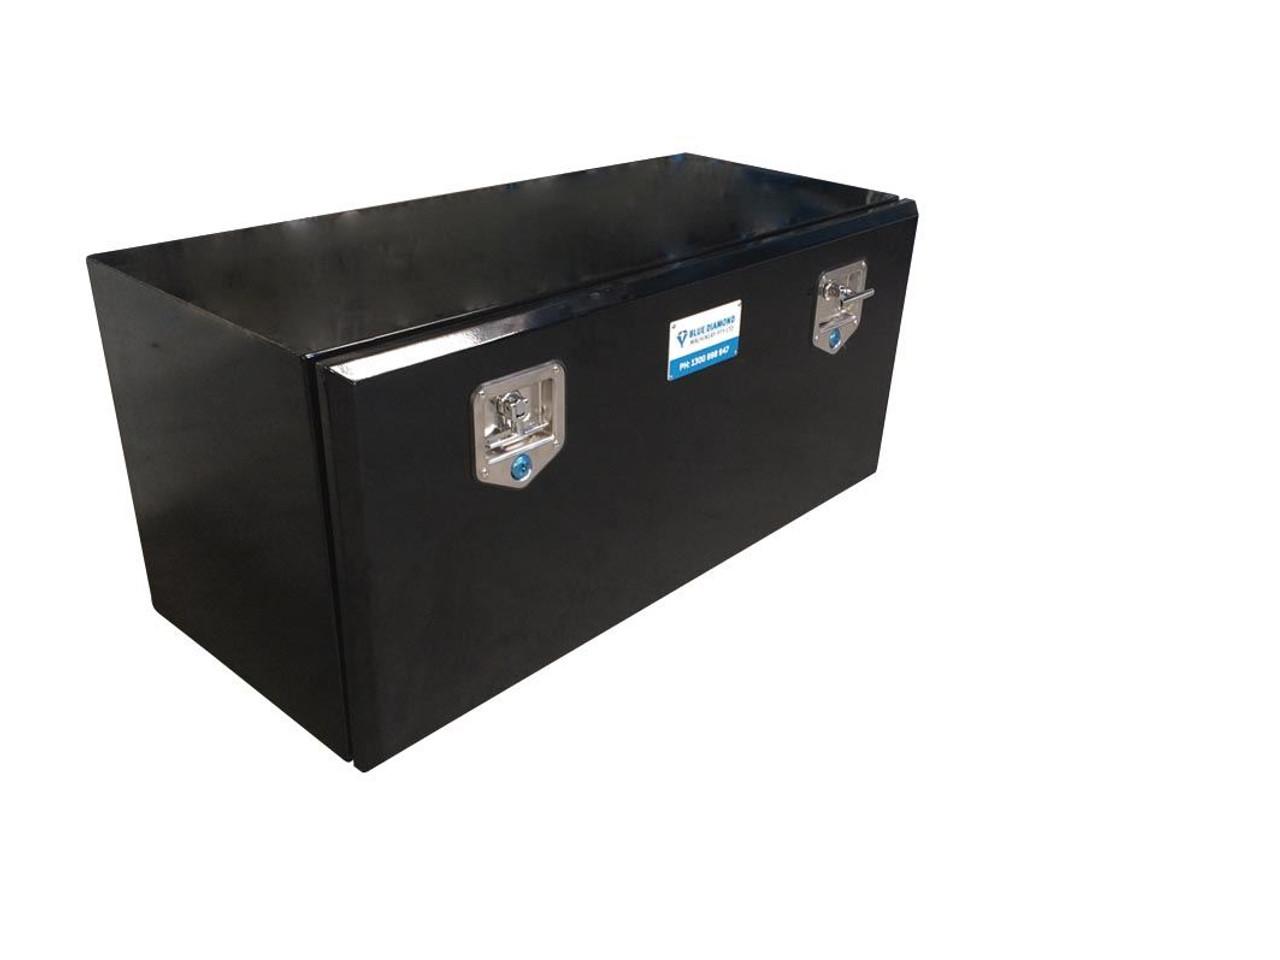 underbody black steel tool box for UTE or Truck